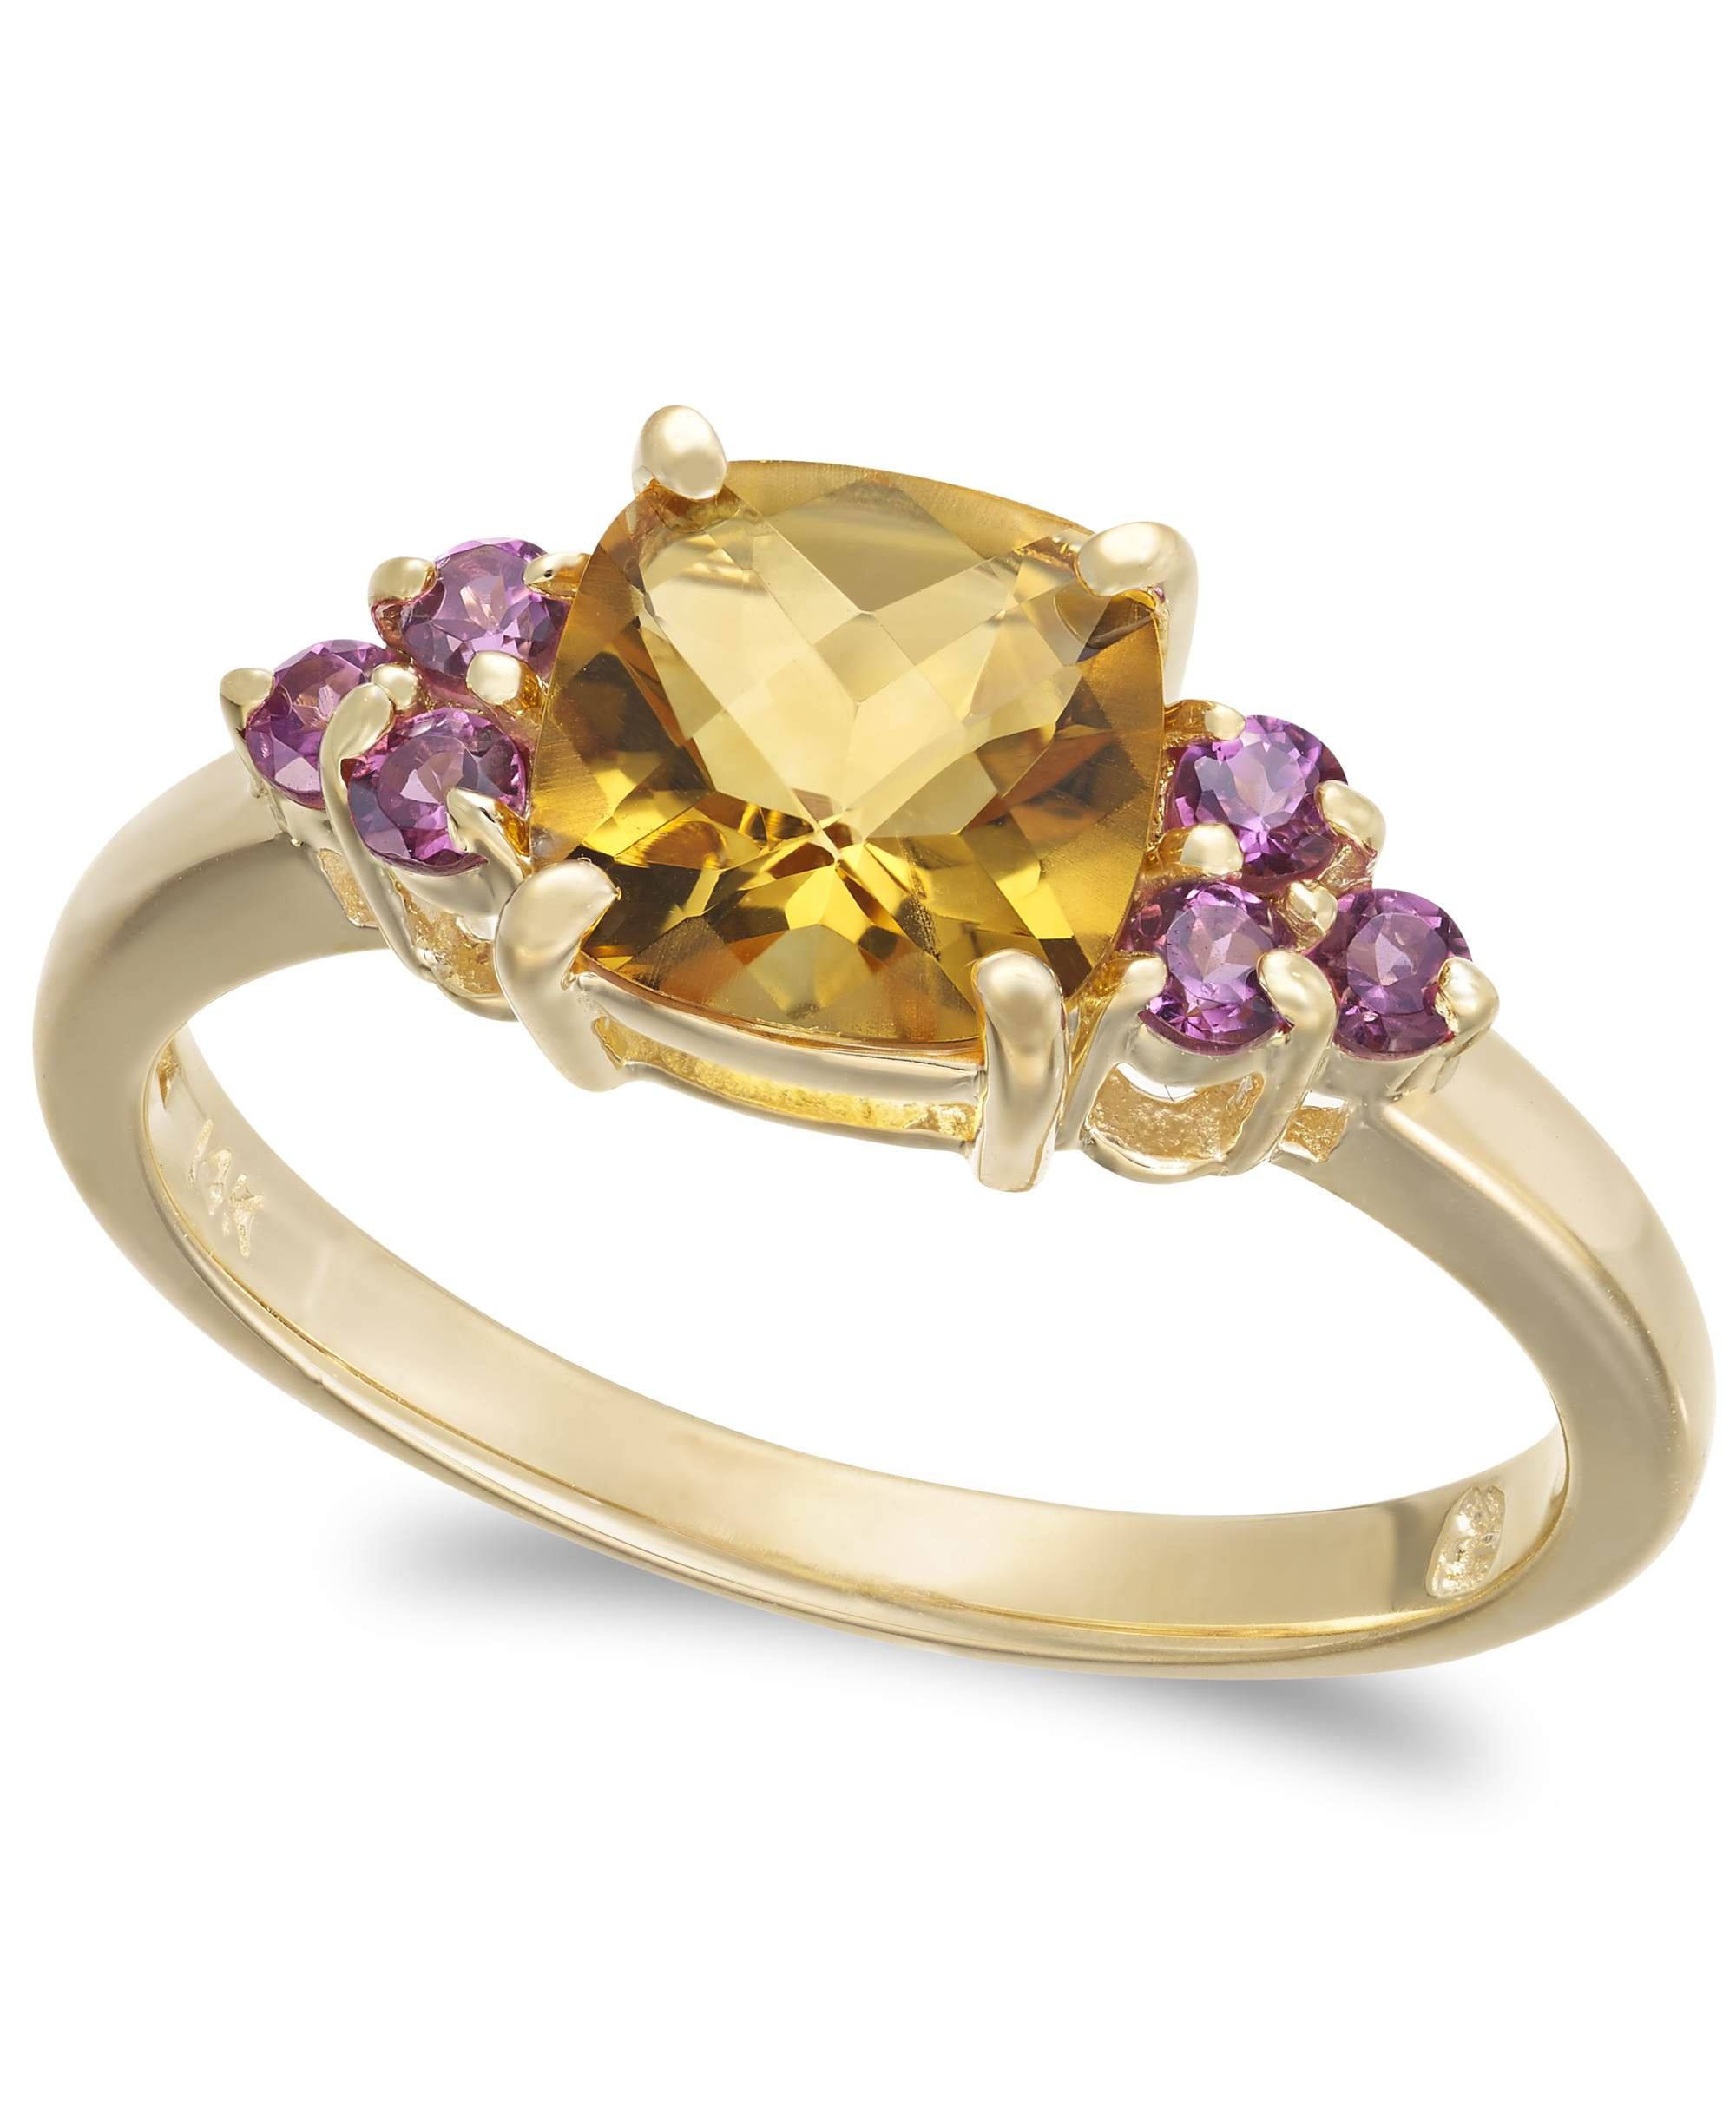 citrine_goldring_jewelryphtogrpahy.jpg